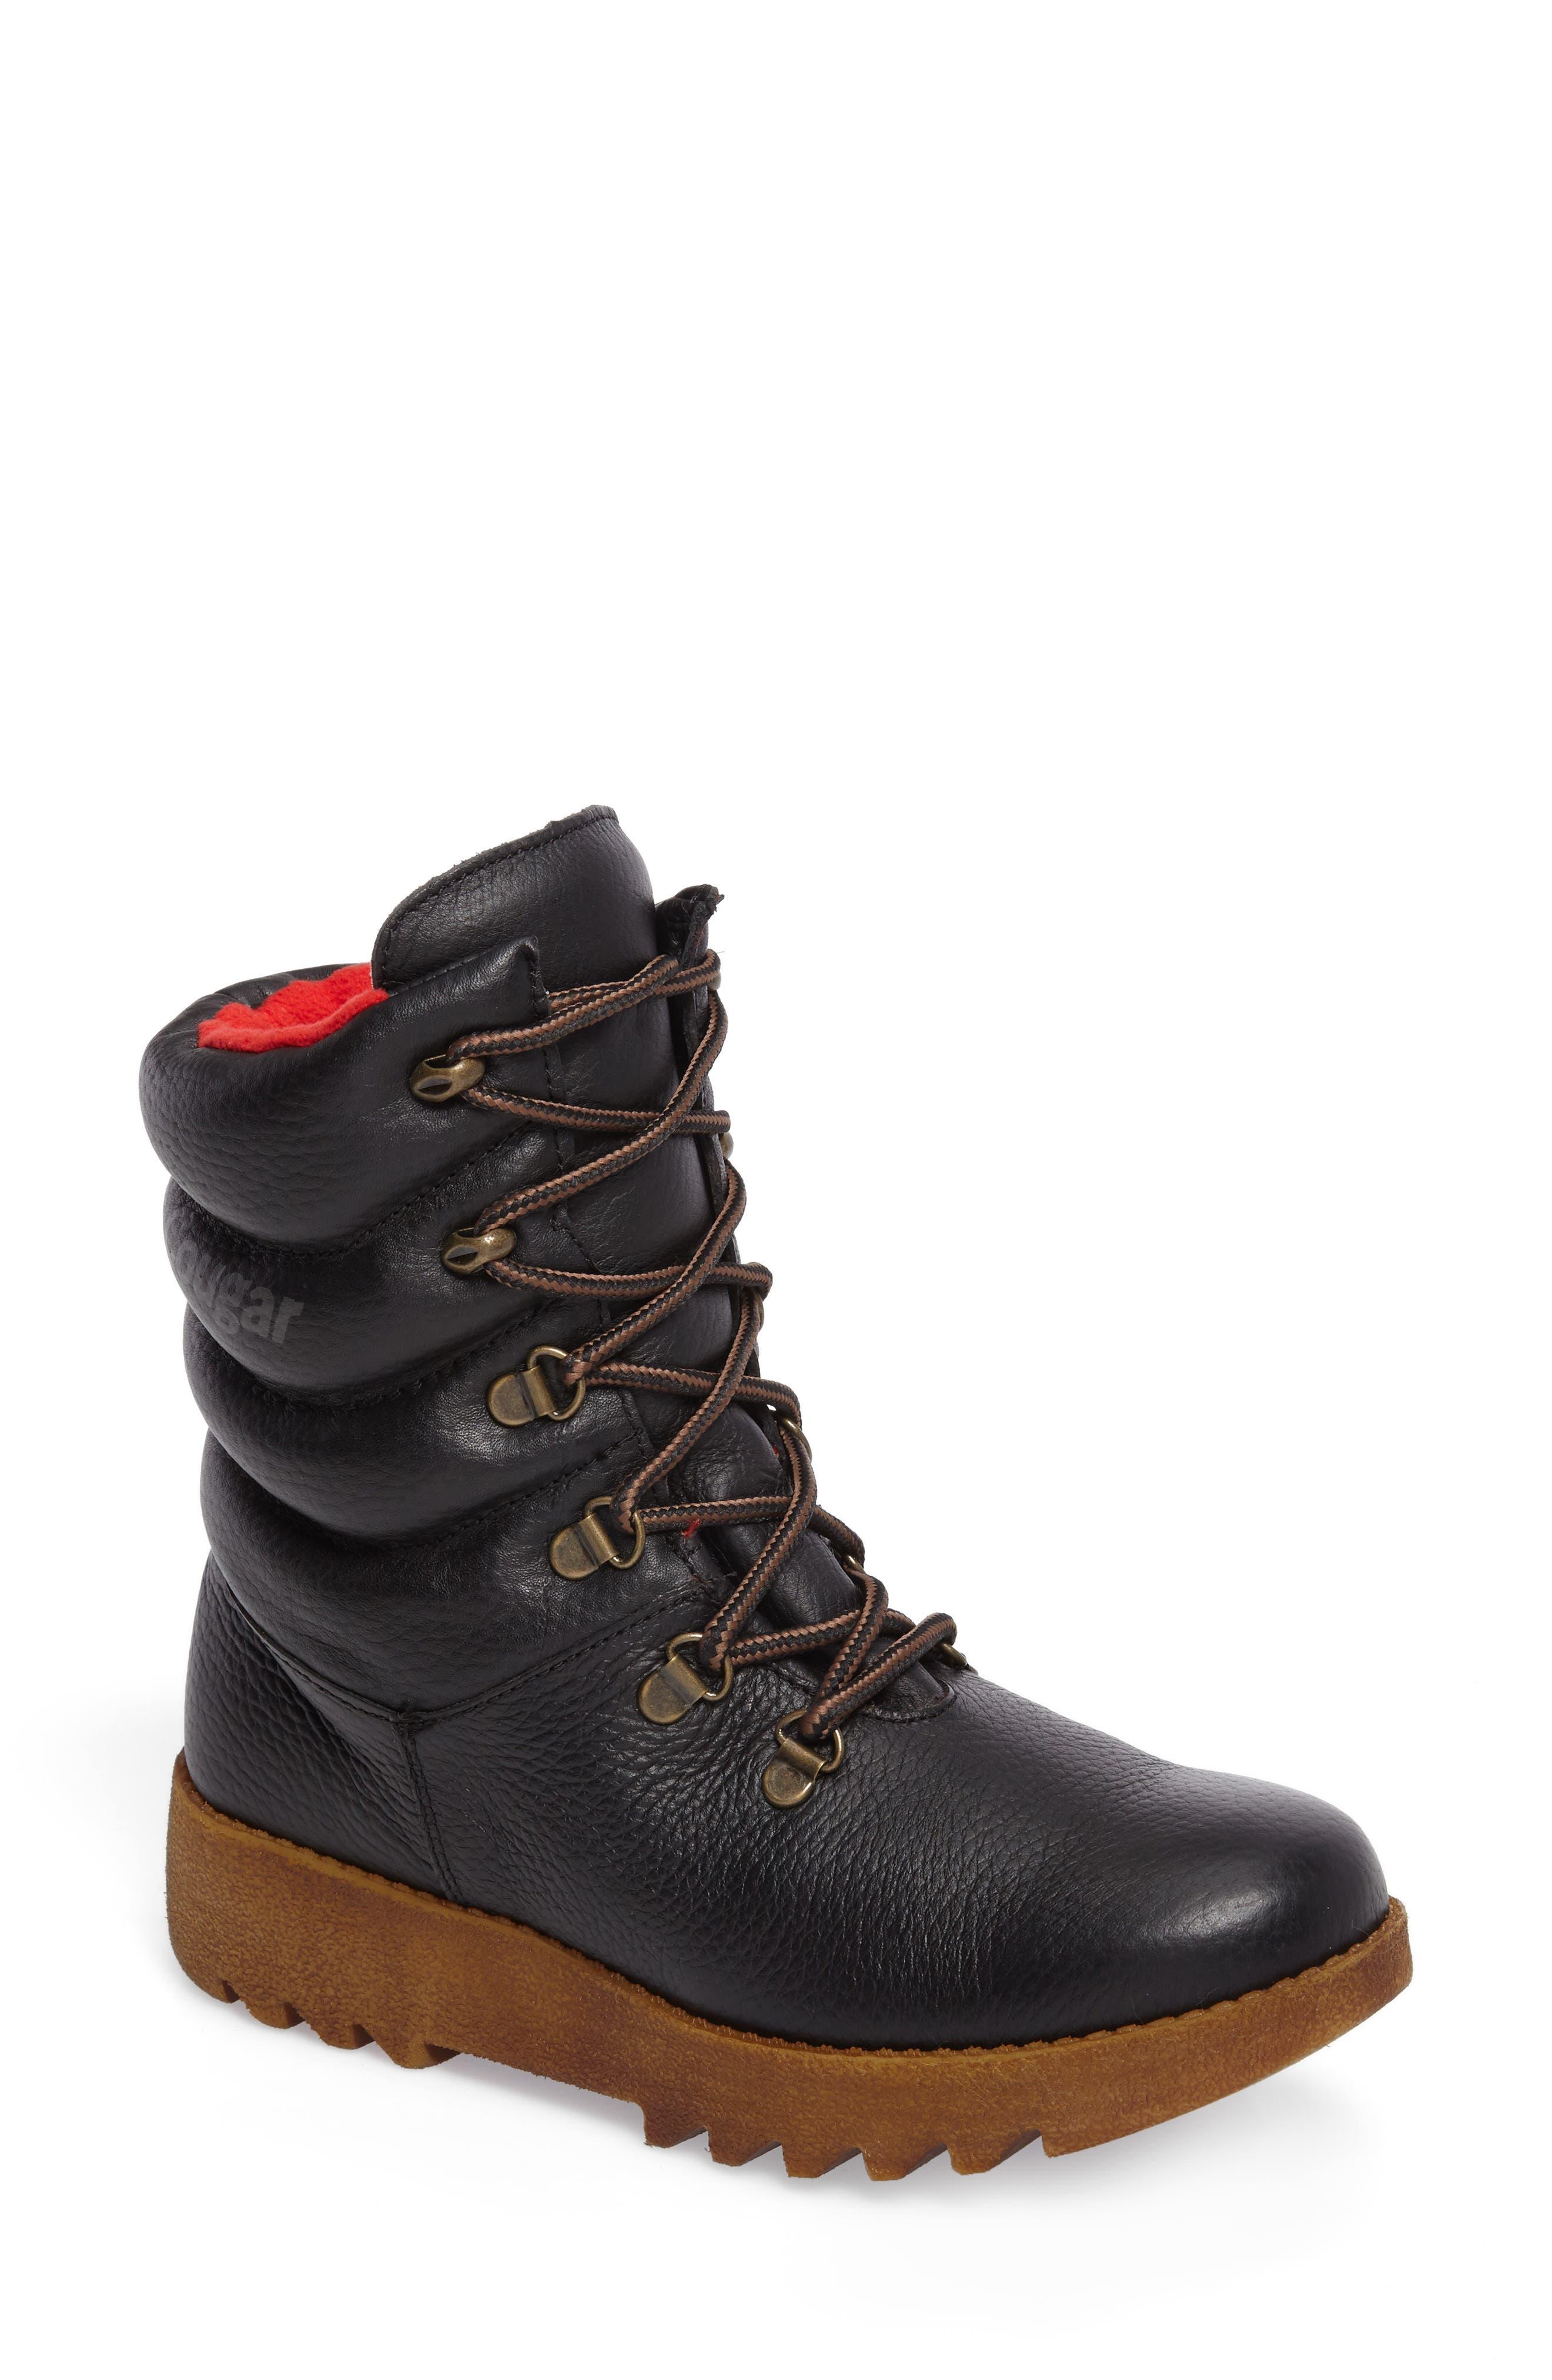 Original Pillow Waterproof Boot,                         Main,                         color, Black Leather